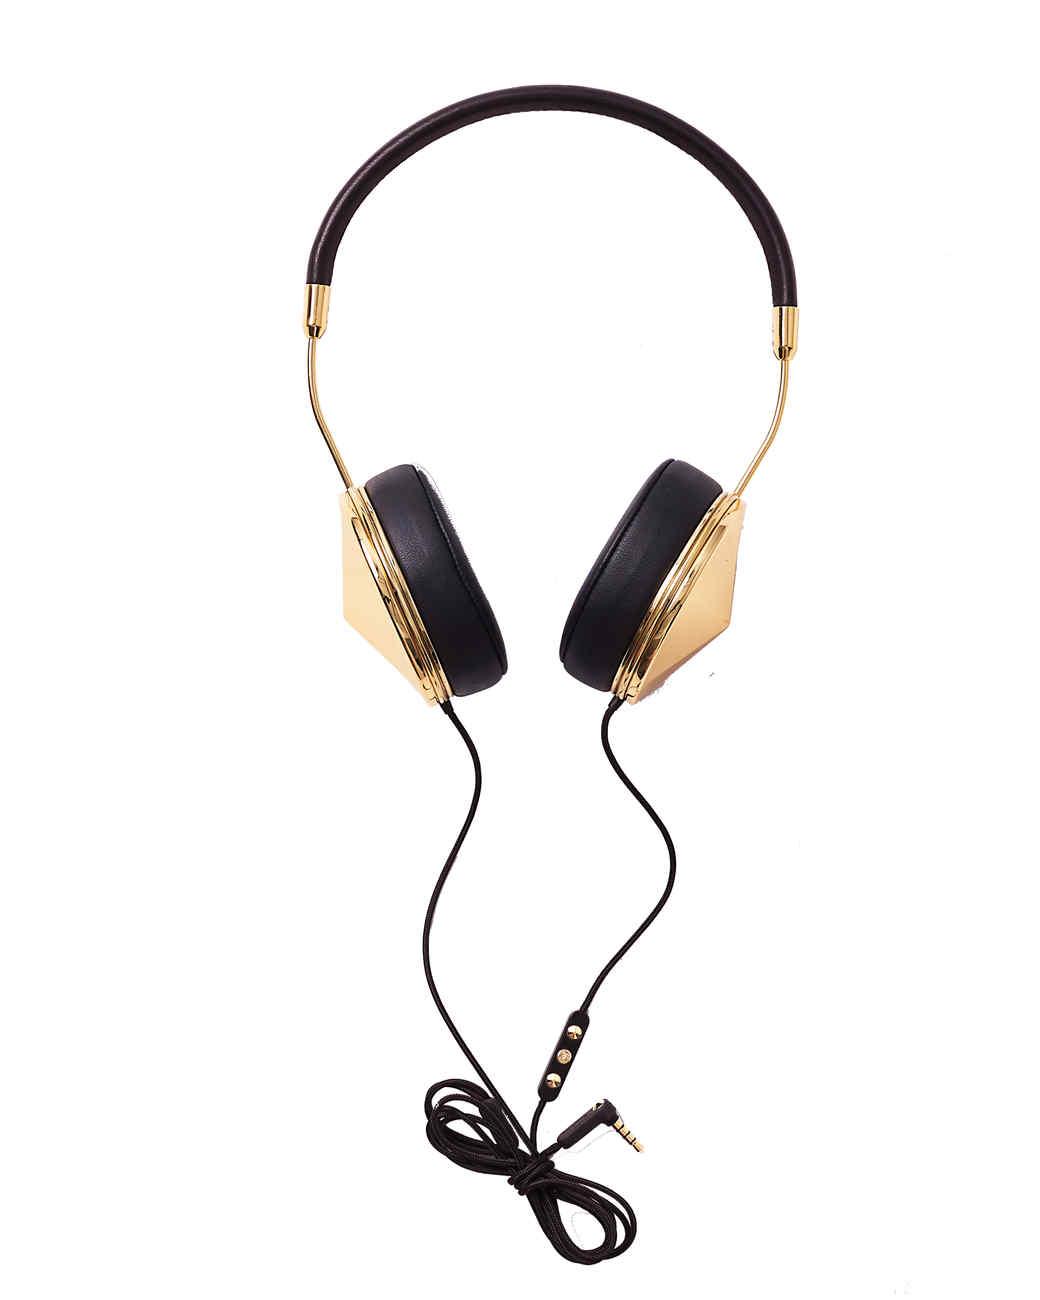 gold-headphones-072-d111219.jpg